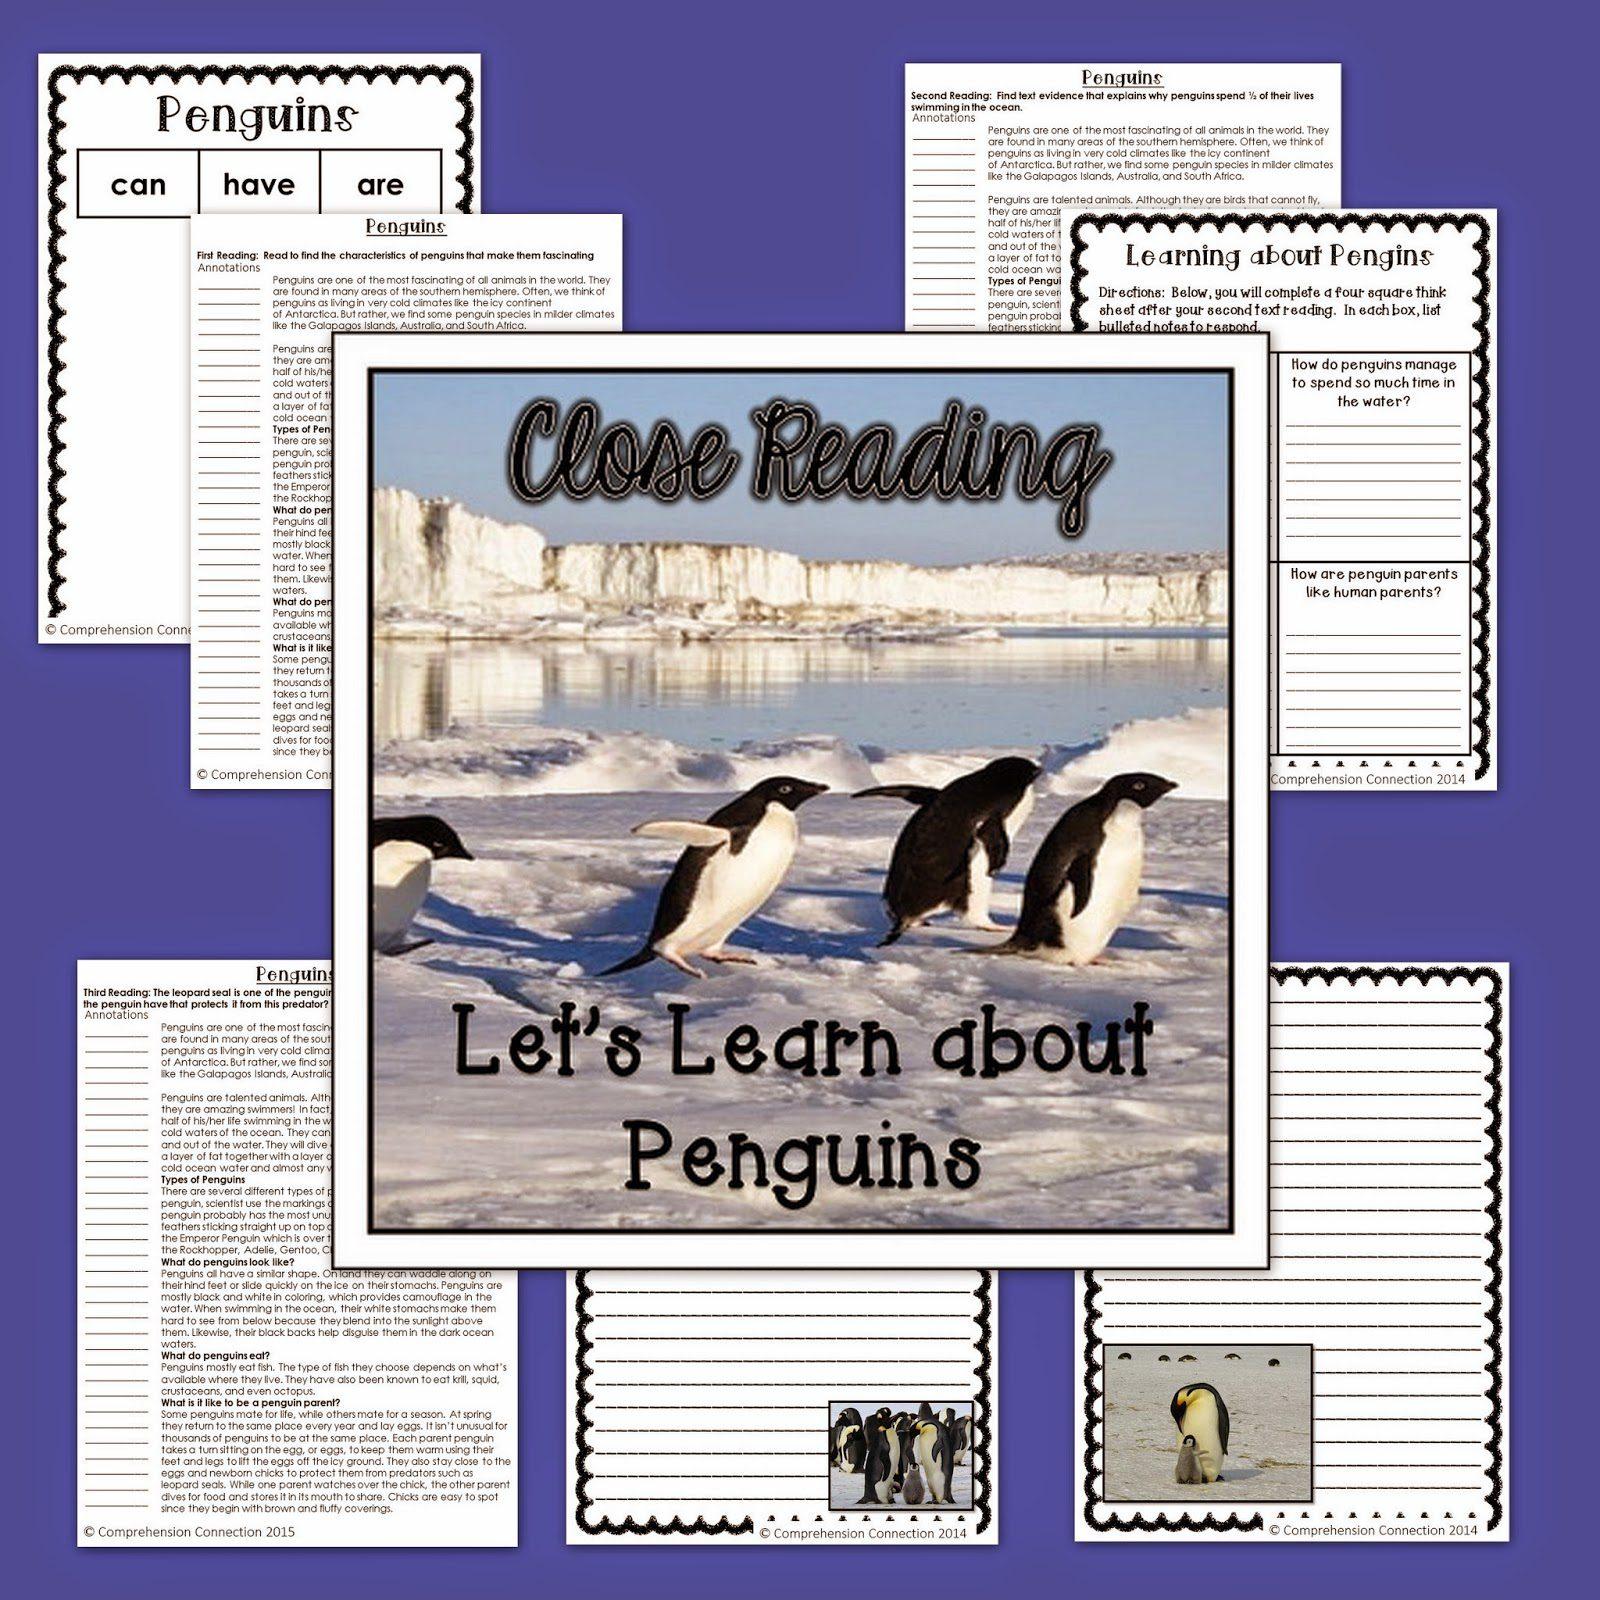 penguins2binformational2btext-8103356